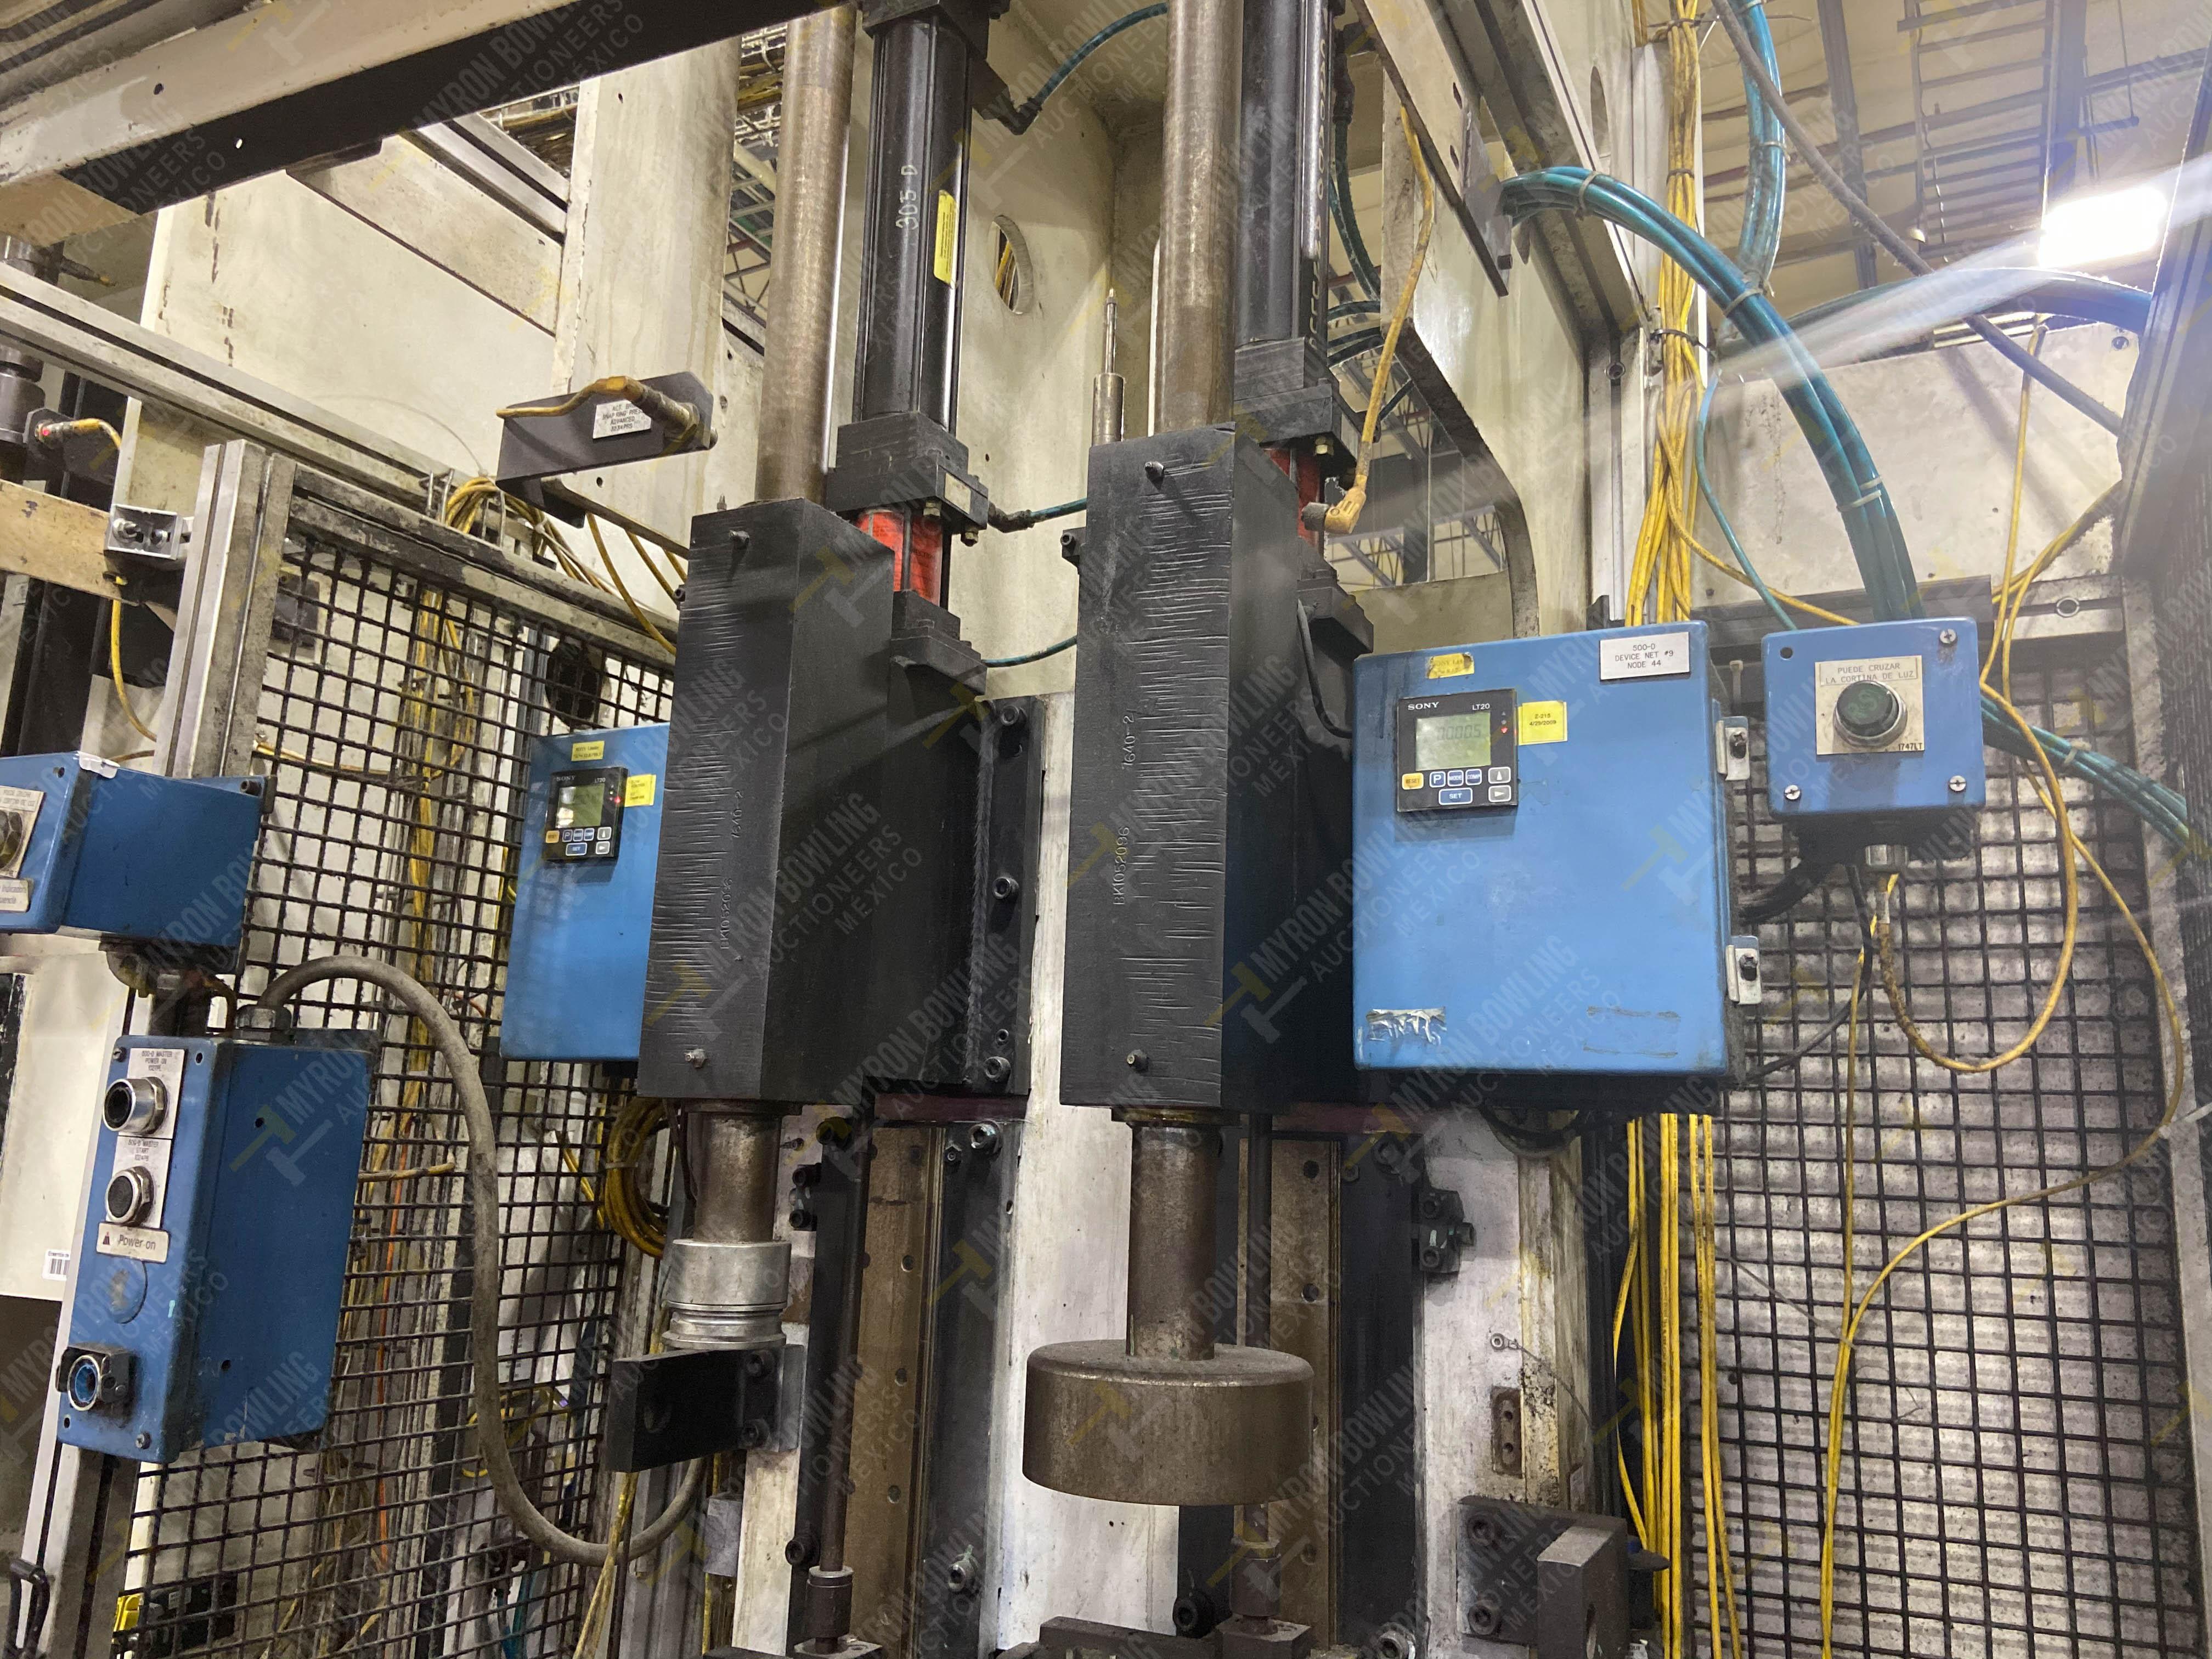 Estación semiautomática para operación 305D, contiene: Prensa tipo cuello de ganso con dos cilindros - Image 3 of 20